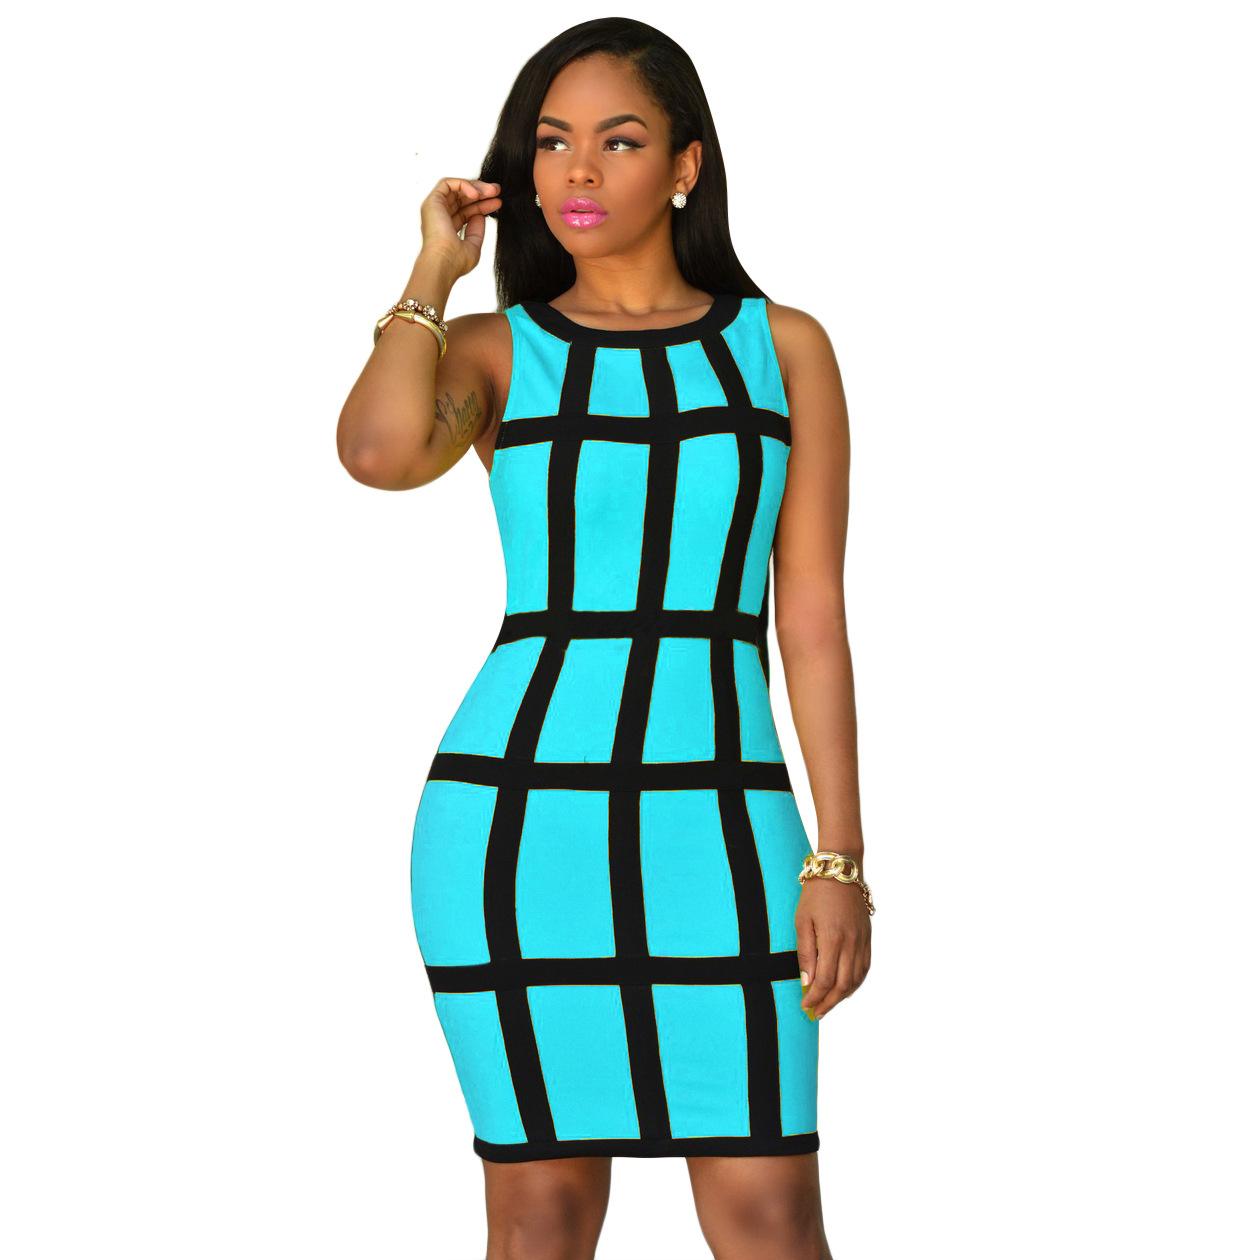 d8fad6dee961 US  5.98 - Geometric Sexy Bodycon Dress 20858-1 - www.global-lover.com